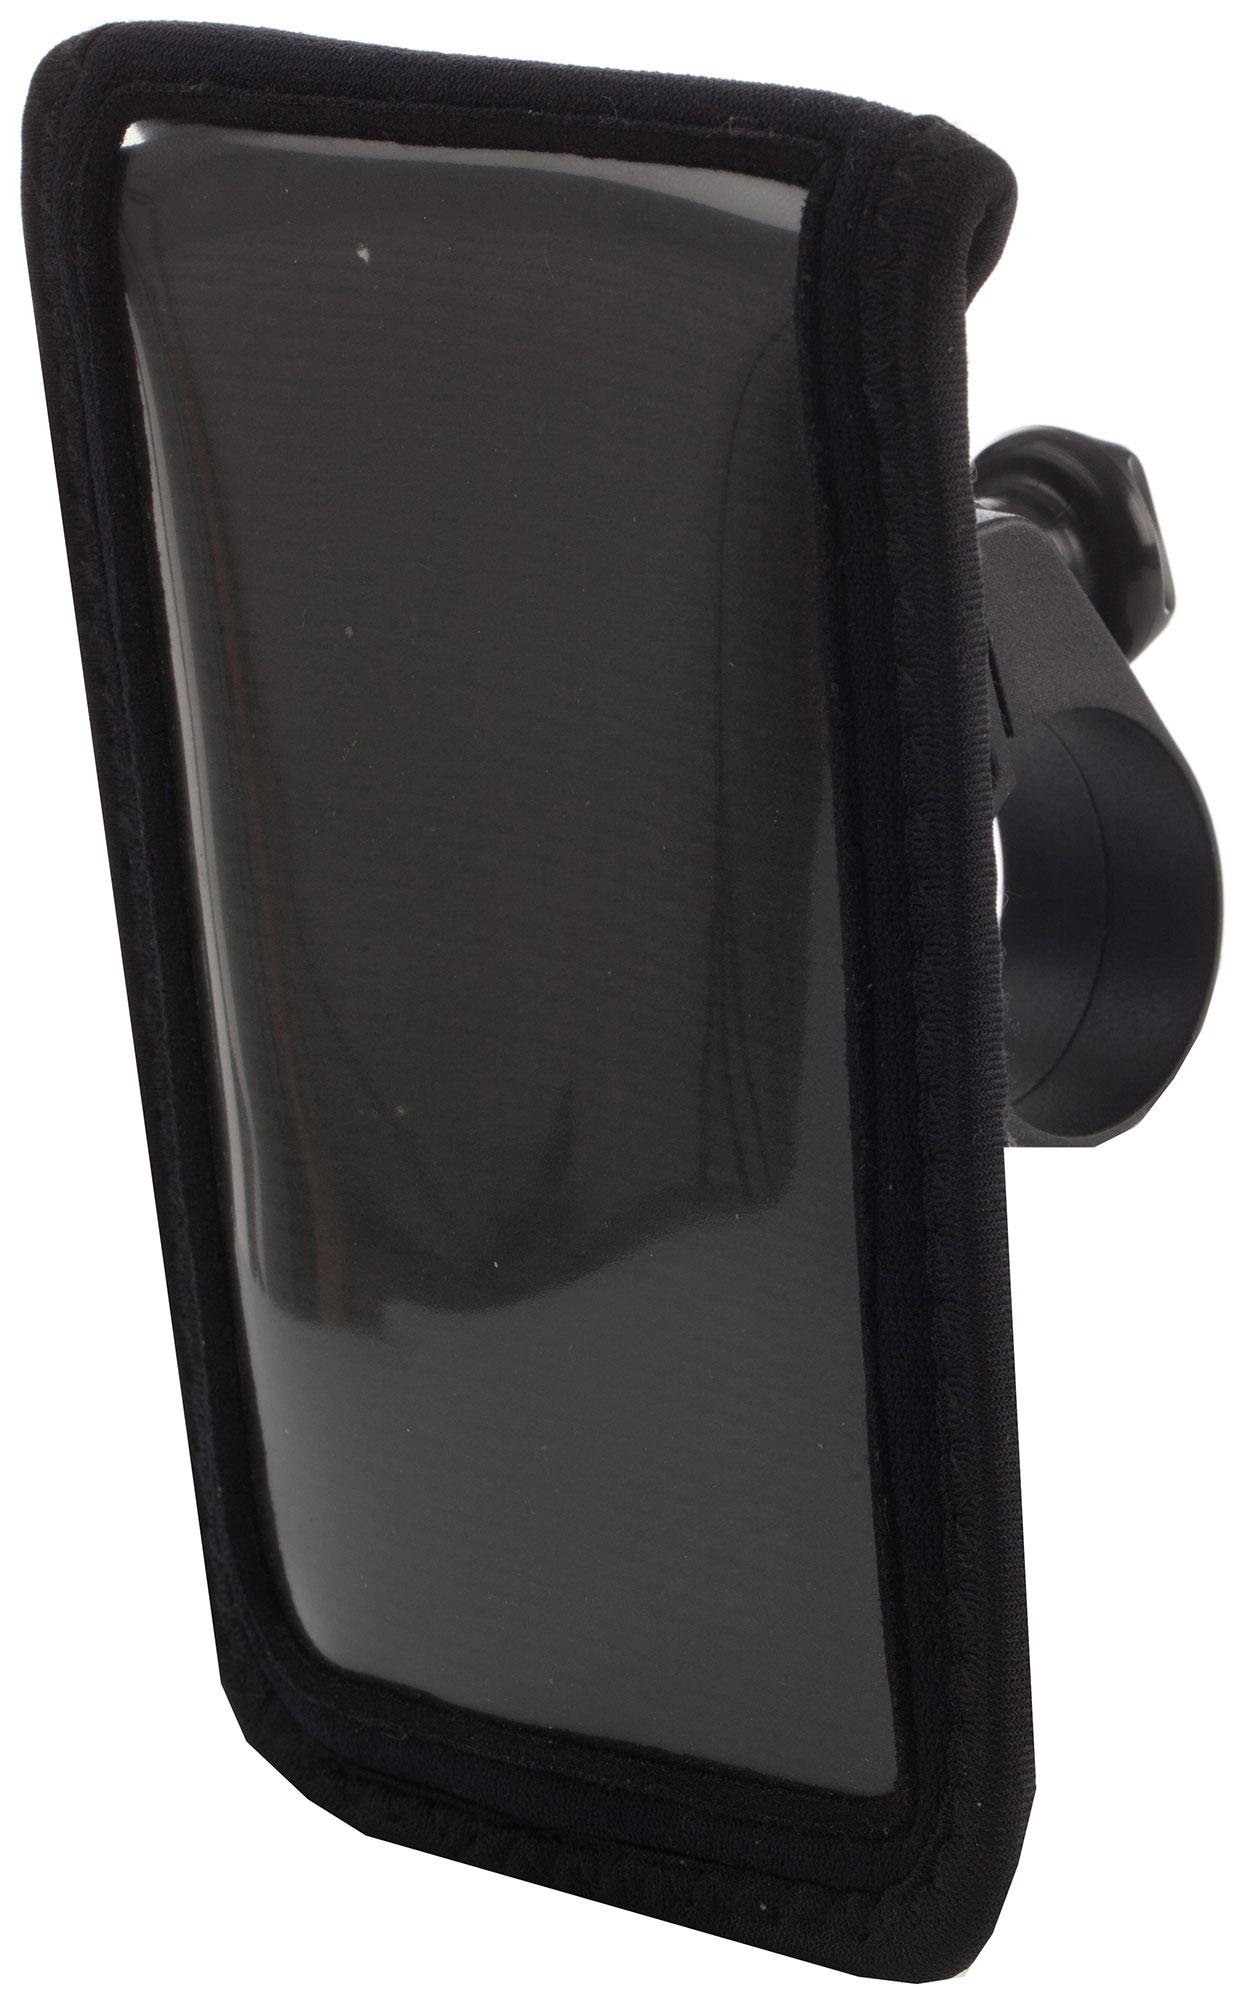 Cyclotech Чехол для смартфона на руль Cyclotech купить чехол для смартфона лджи 880